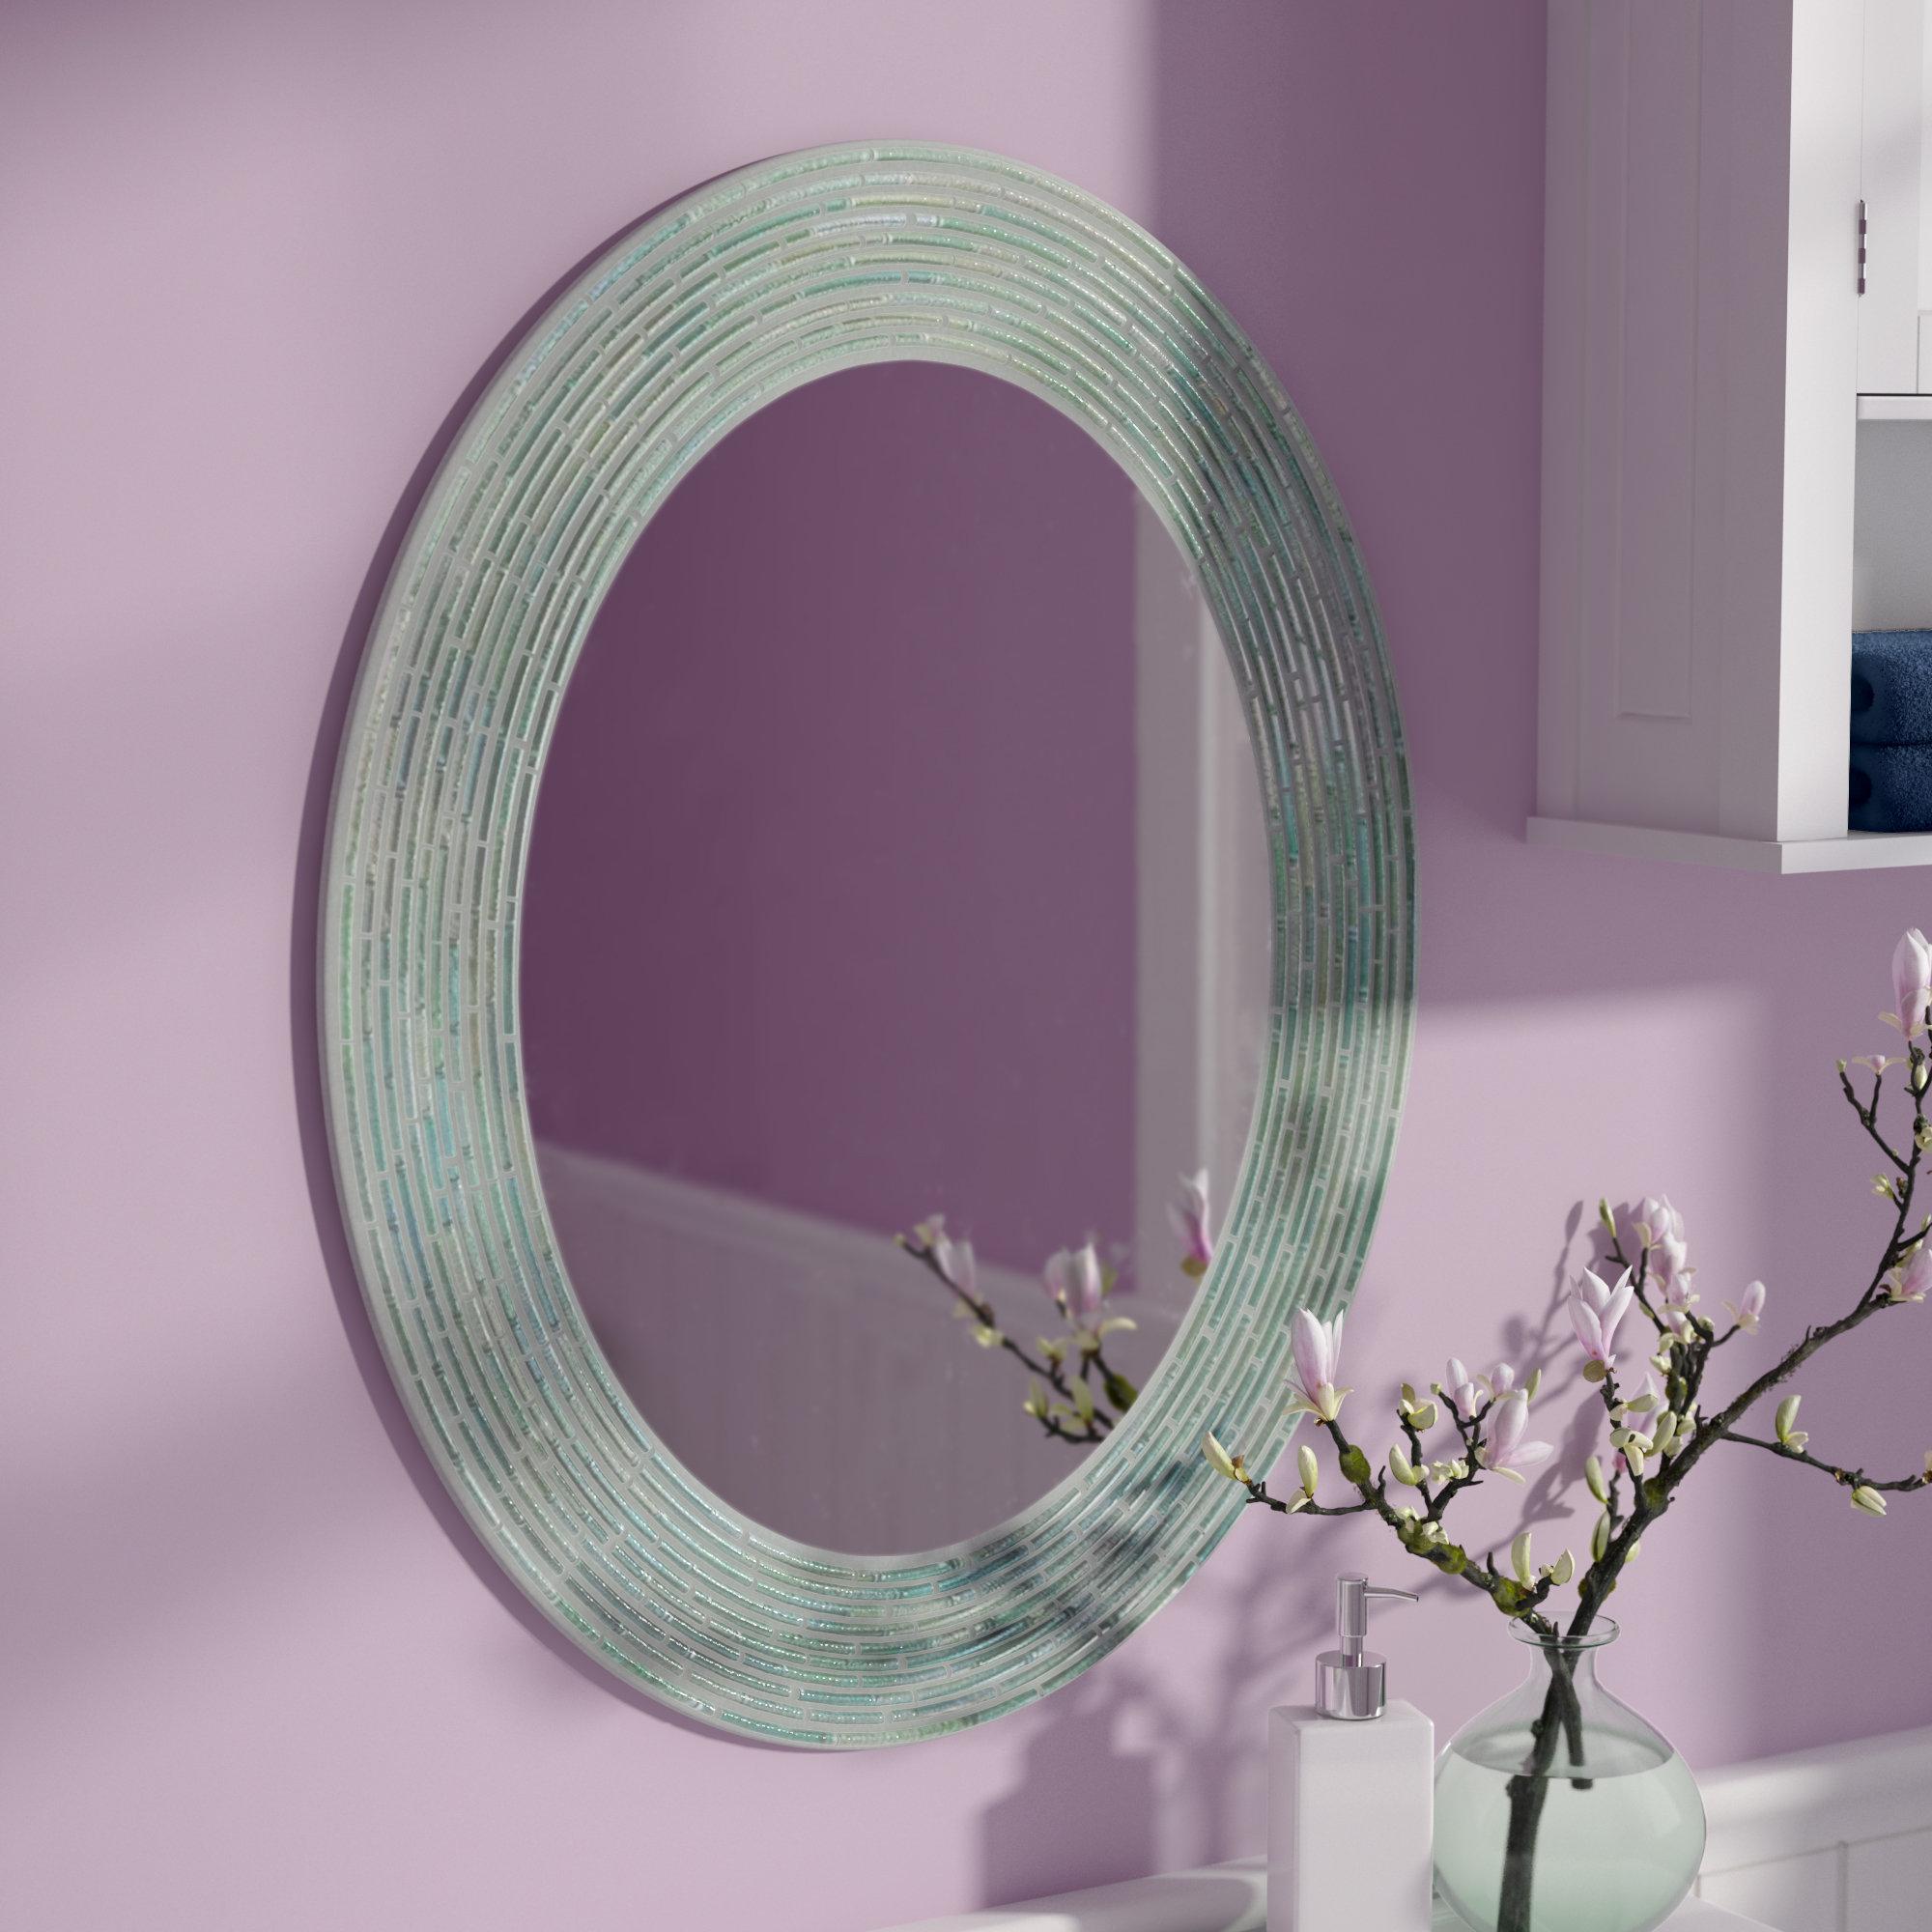 Wegman Accent Wall Mirror | Wayfair (Image 19 of 20)